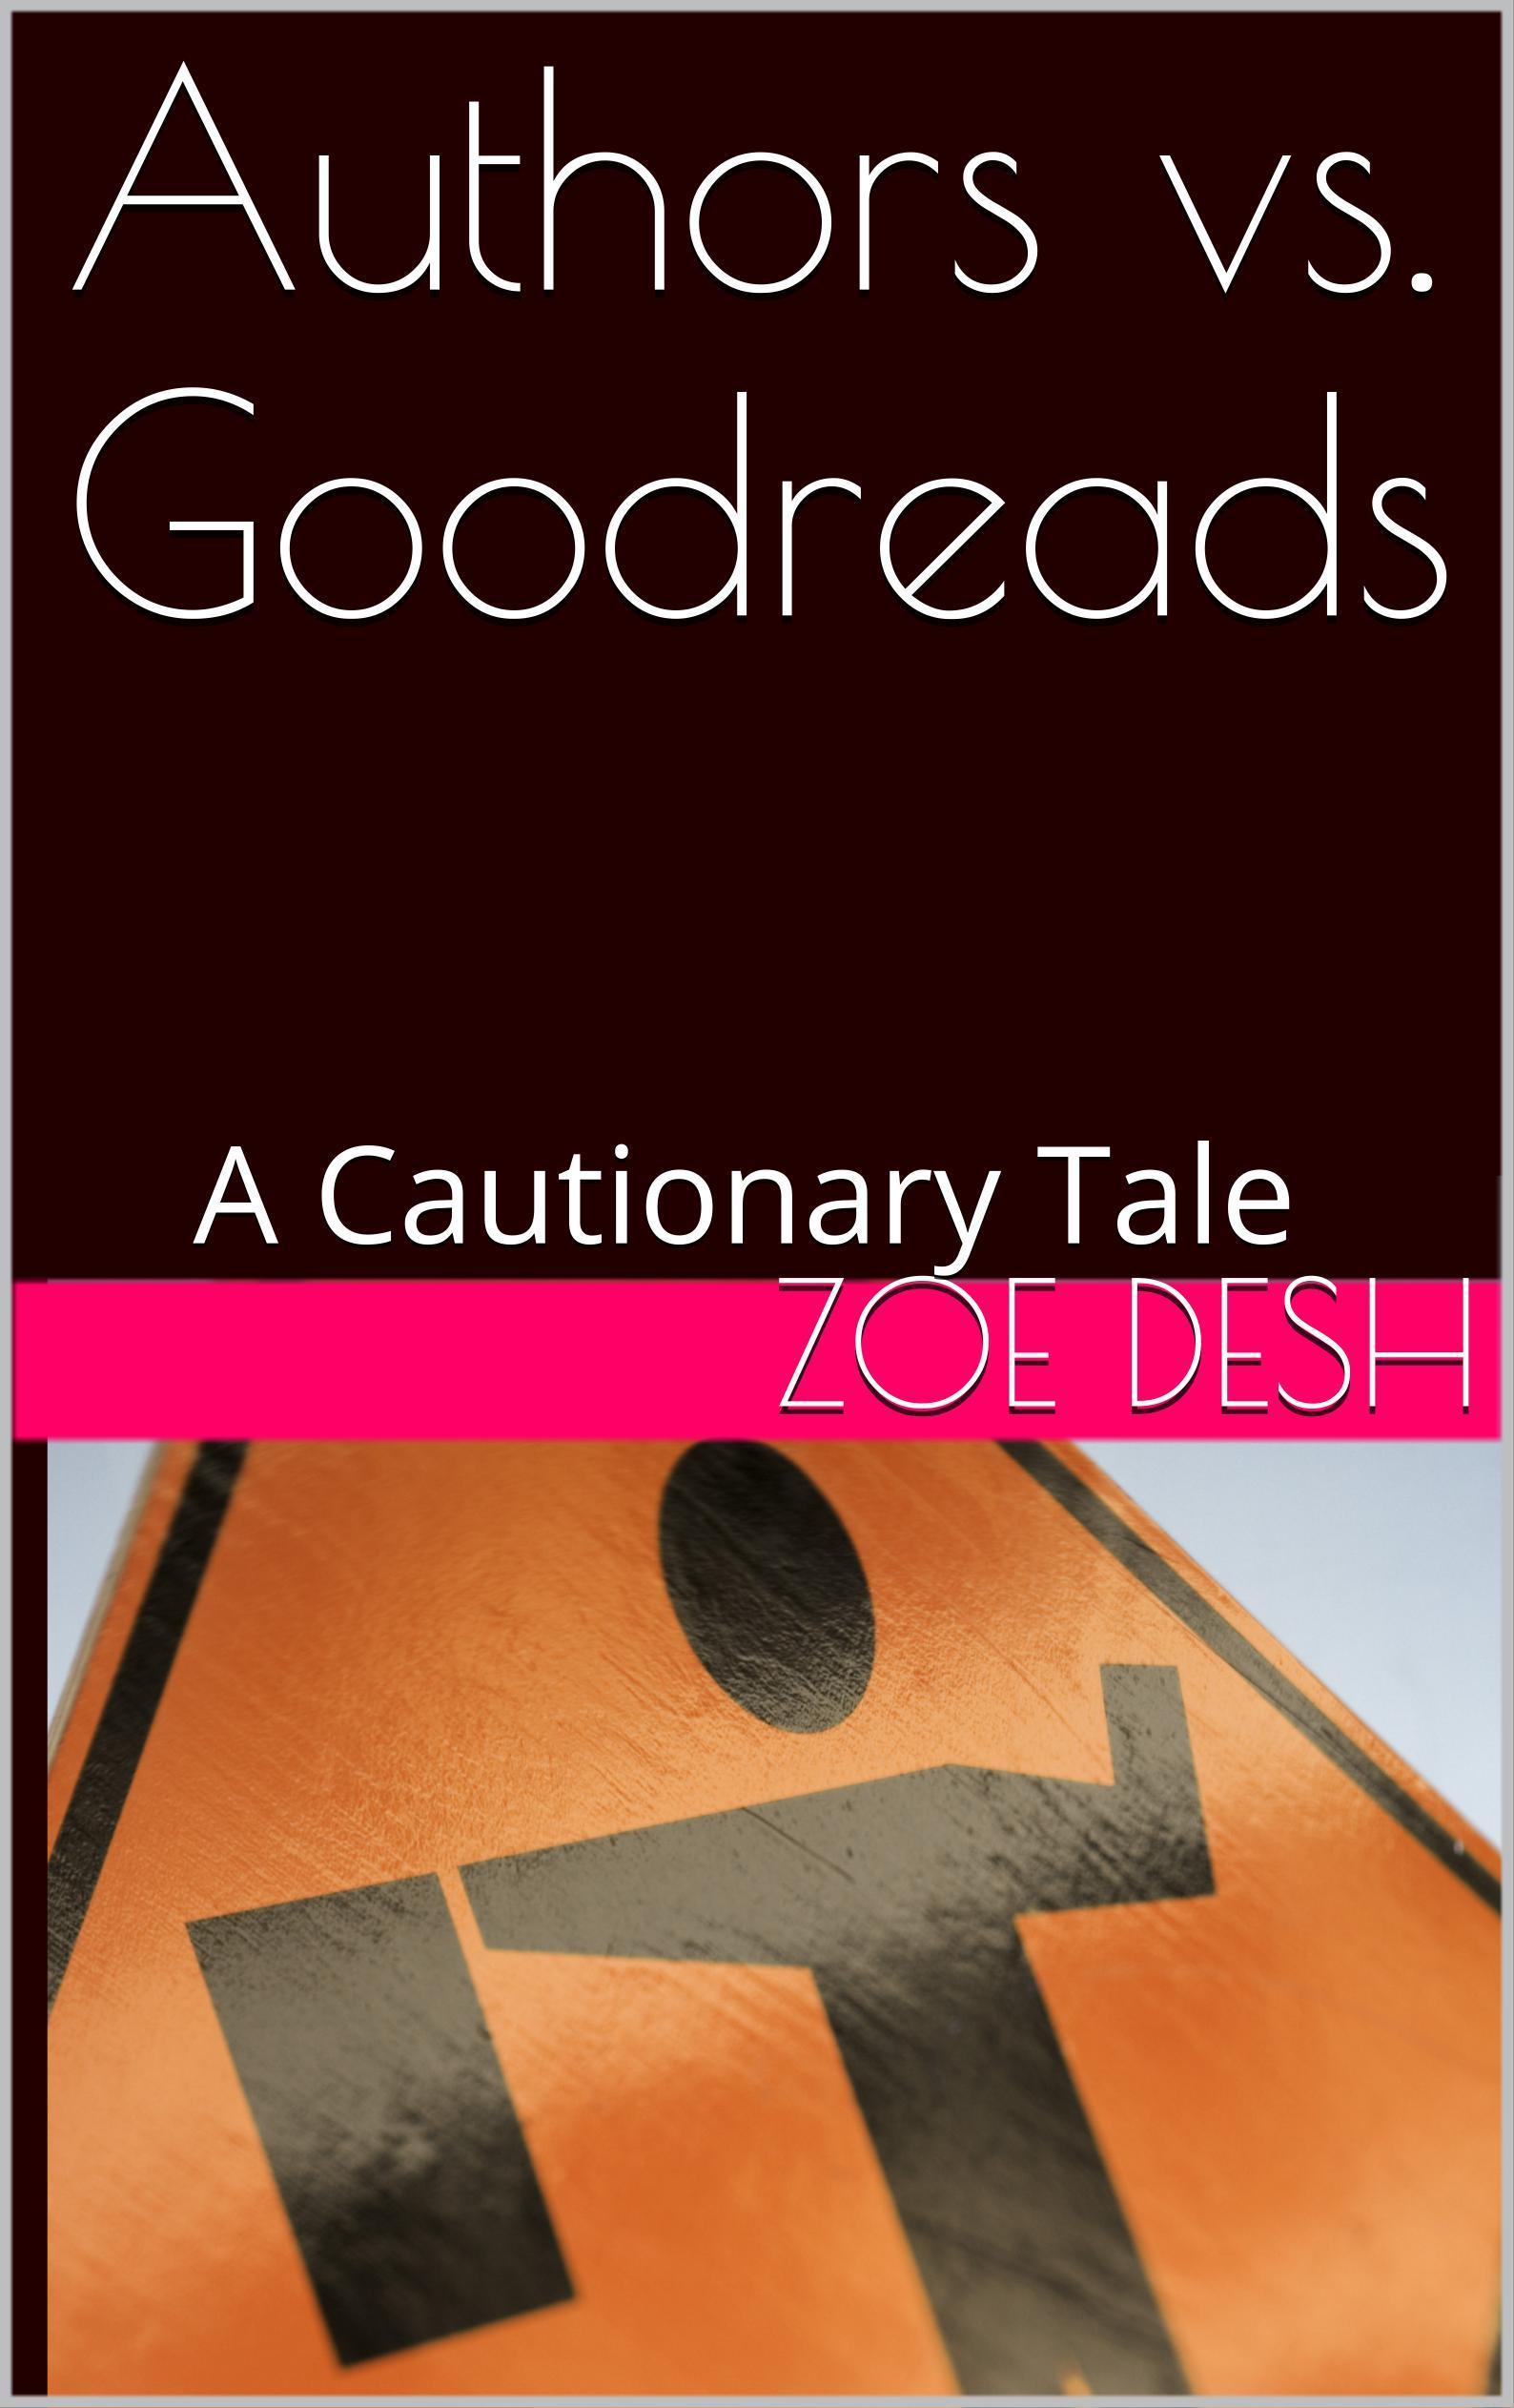 Authors vs. Goodreads Zoe Desh